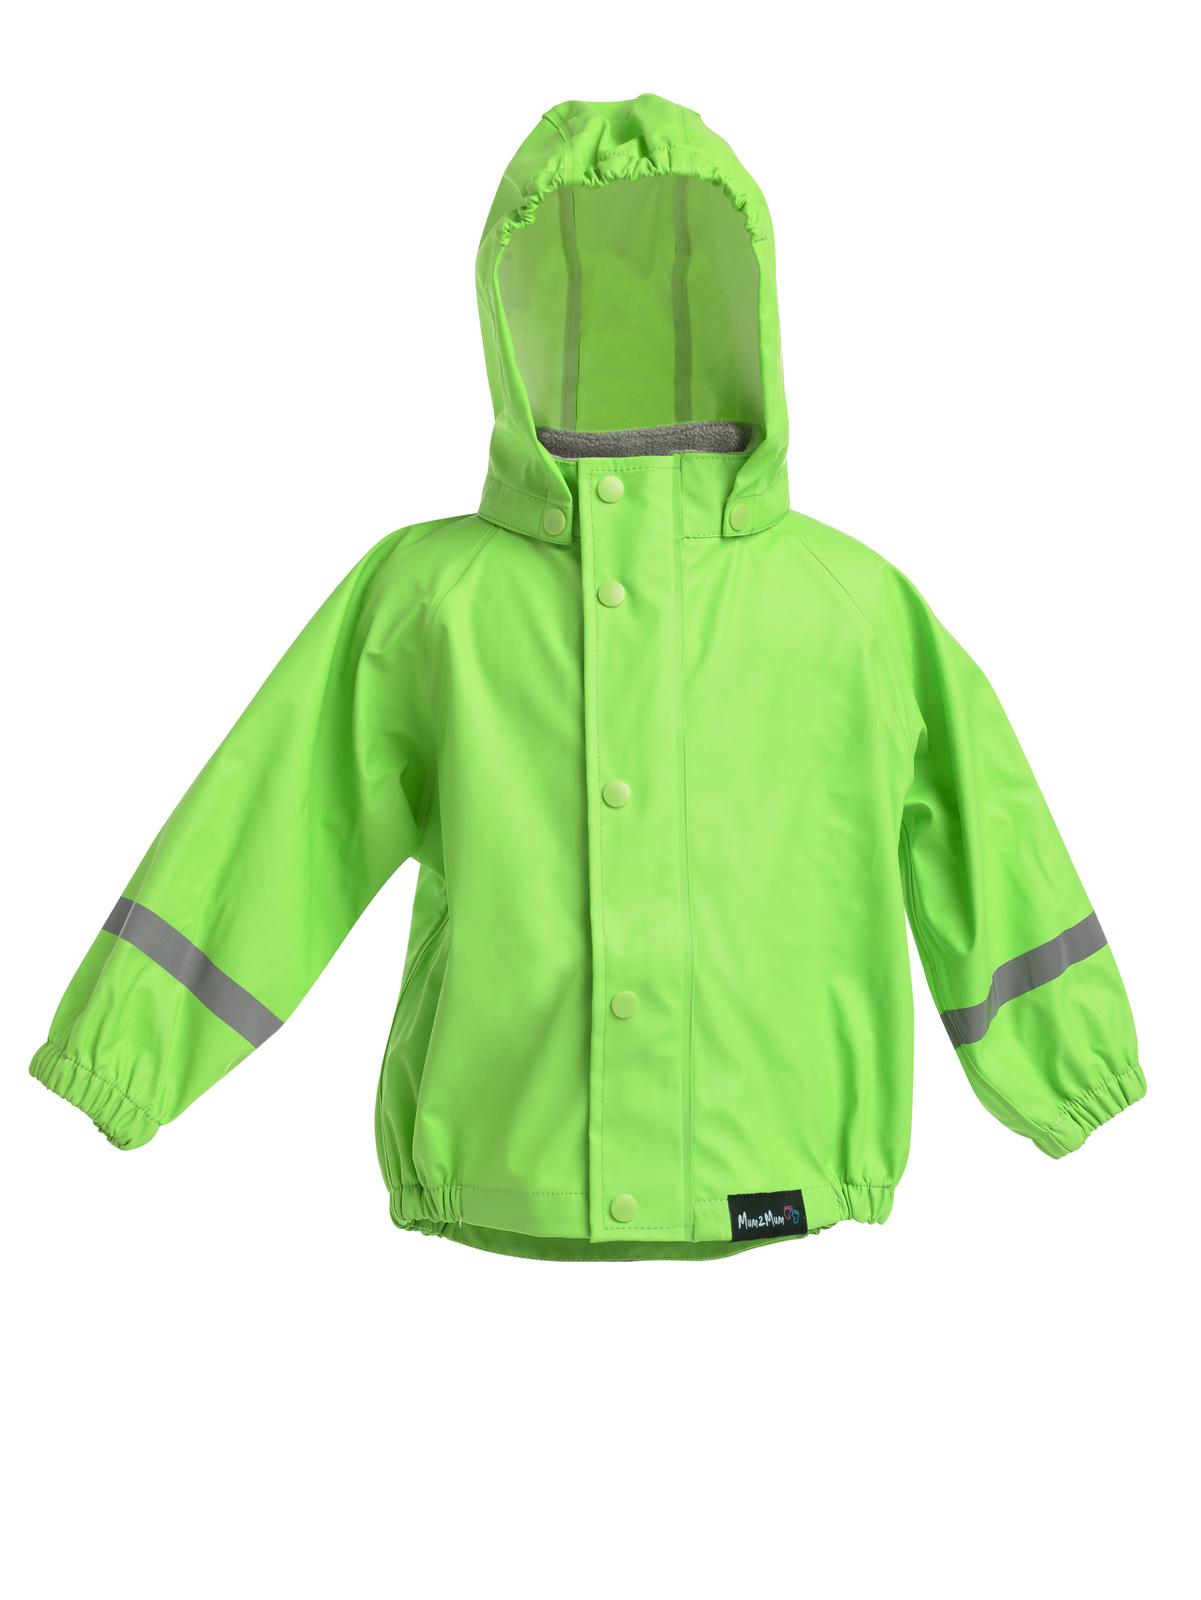 Mum 2 Mum Rain Wear Jacket - Lime (2 Years) image